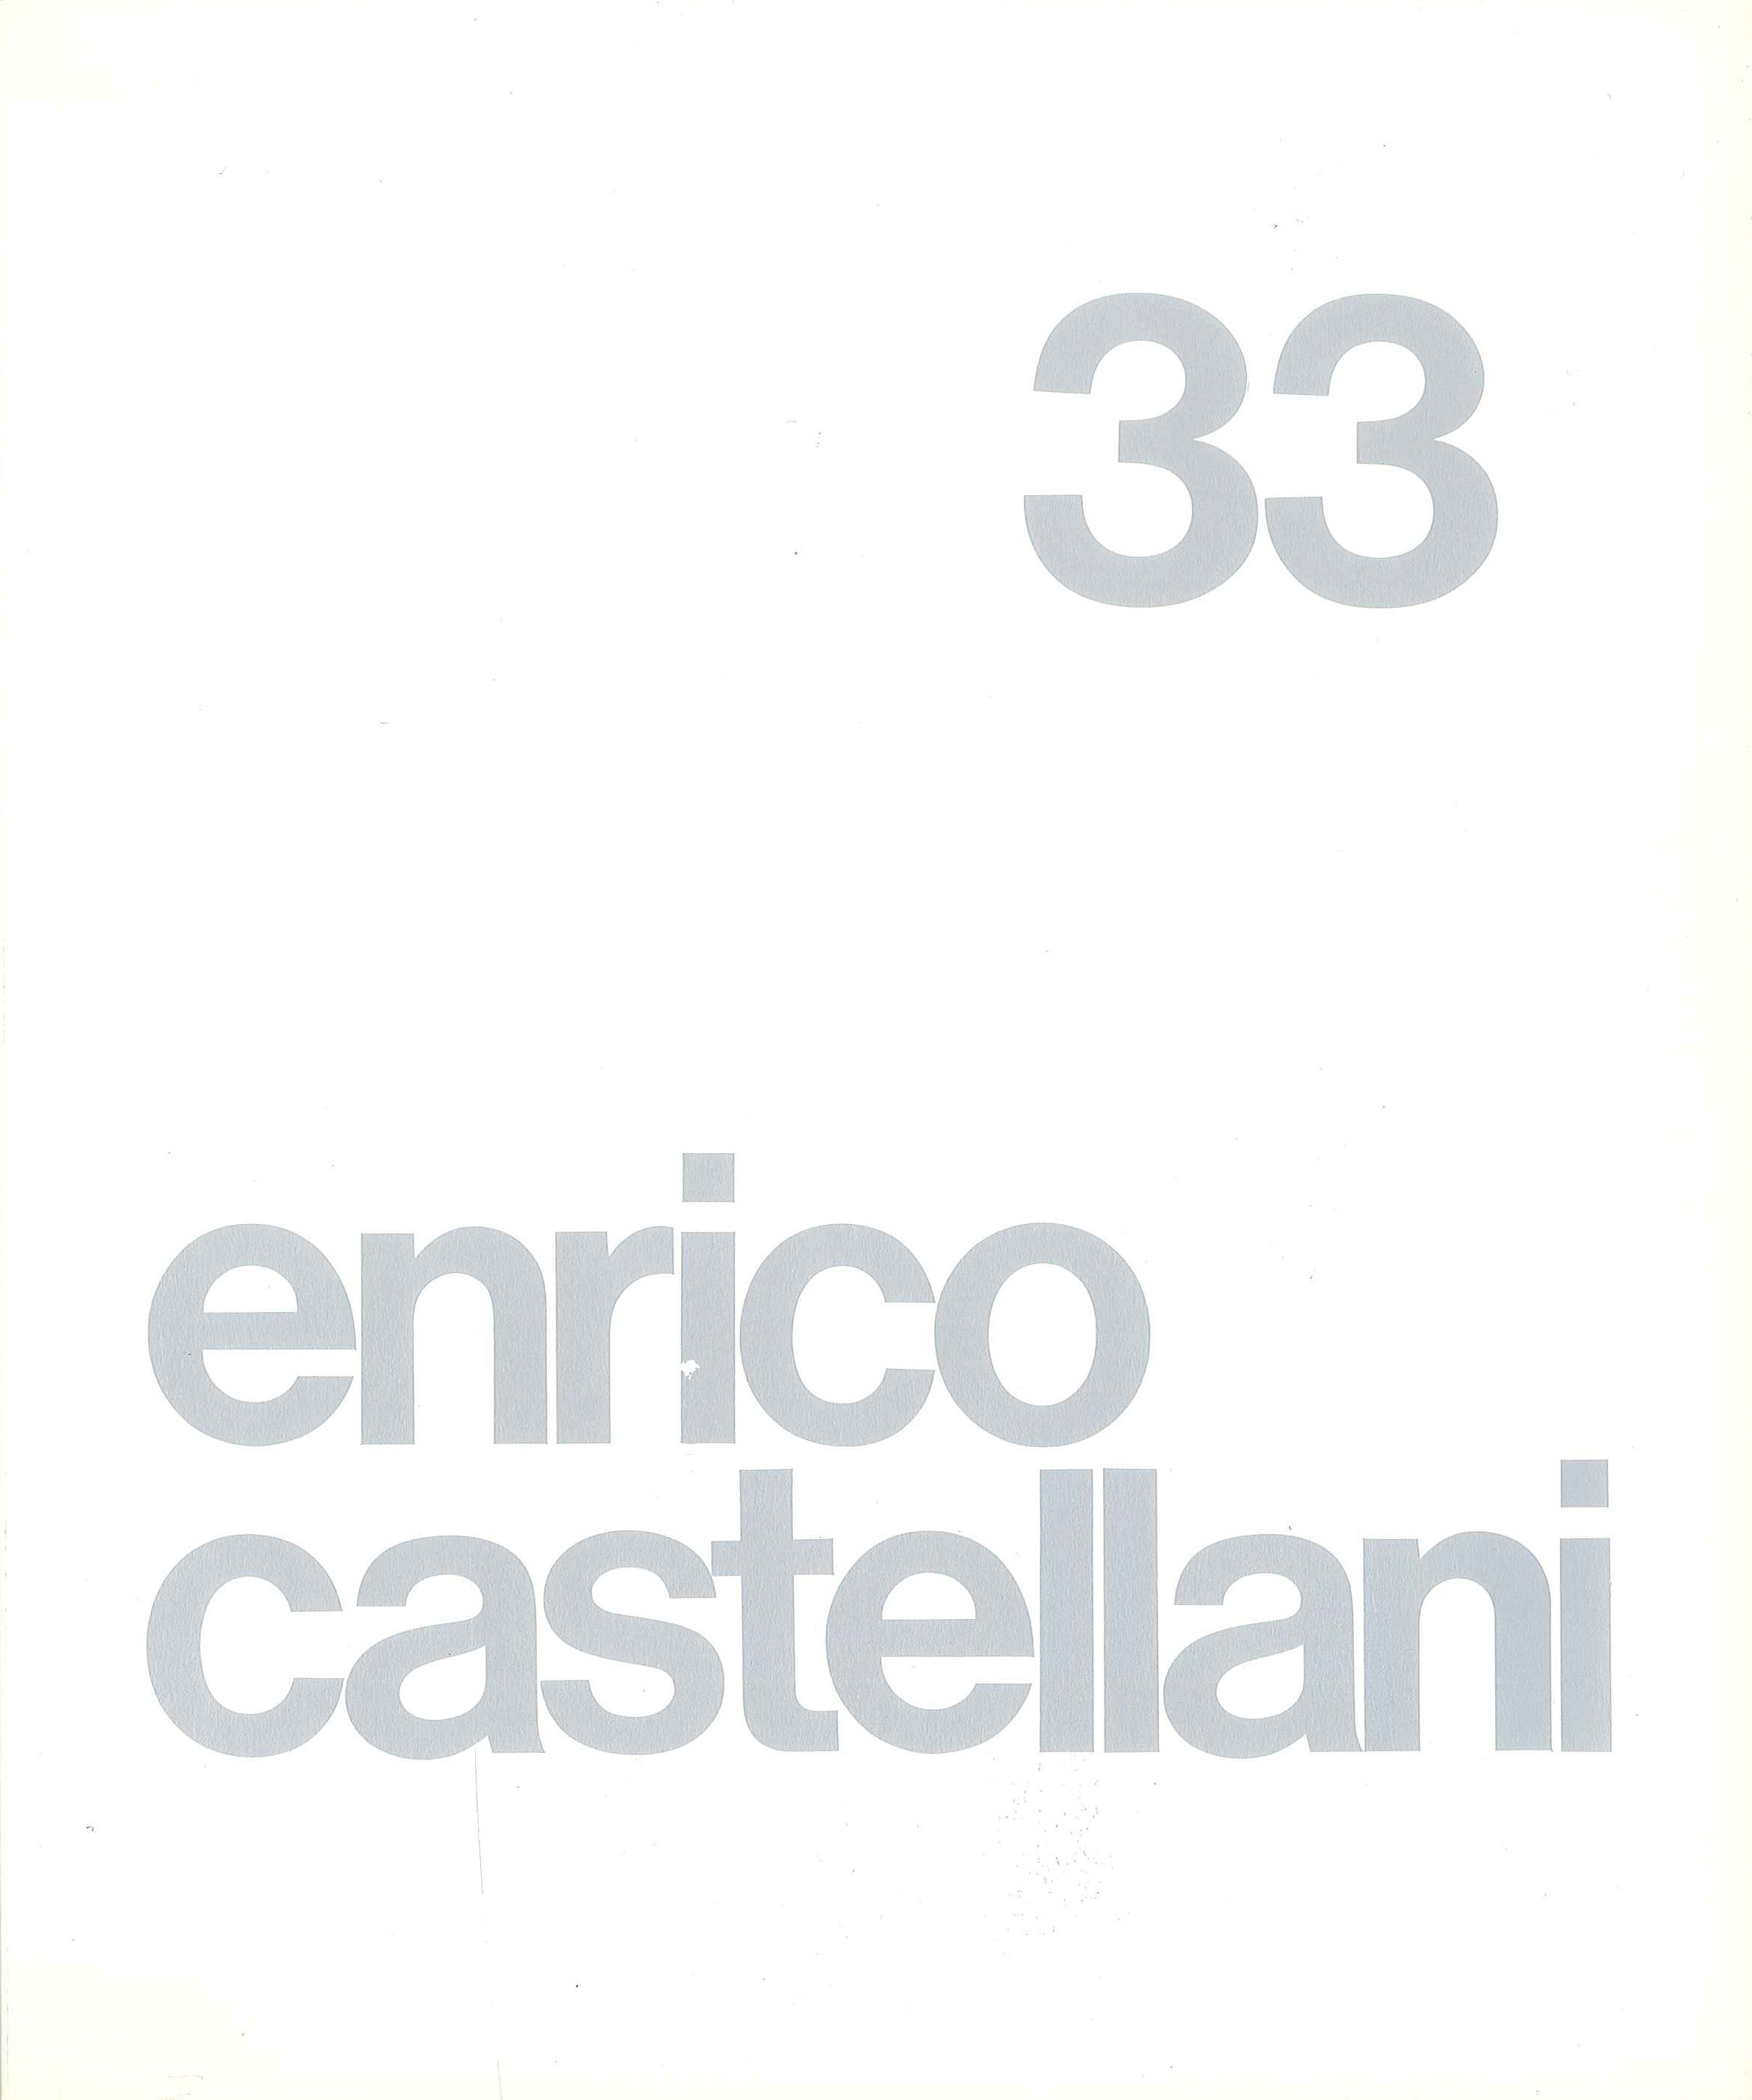 Cover - Enrico Castellani, Adachiara Zevi, 1986, Lorenzelli Arte, Milano